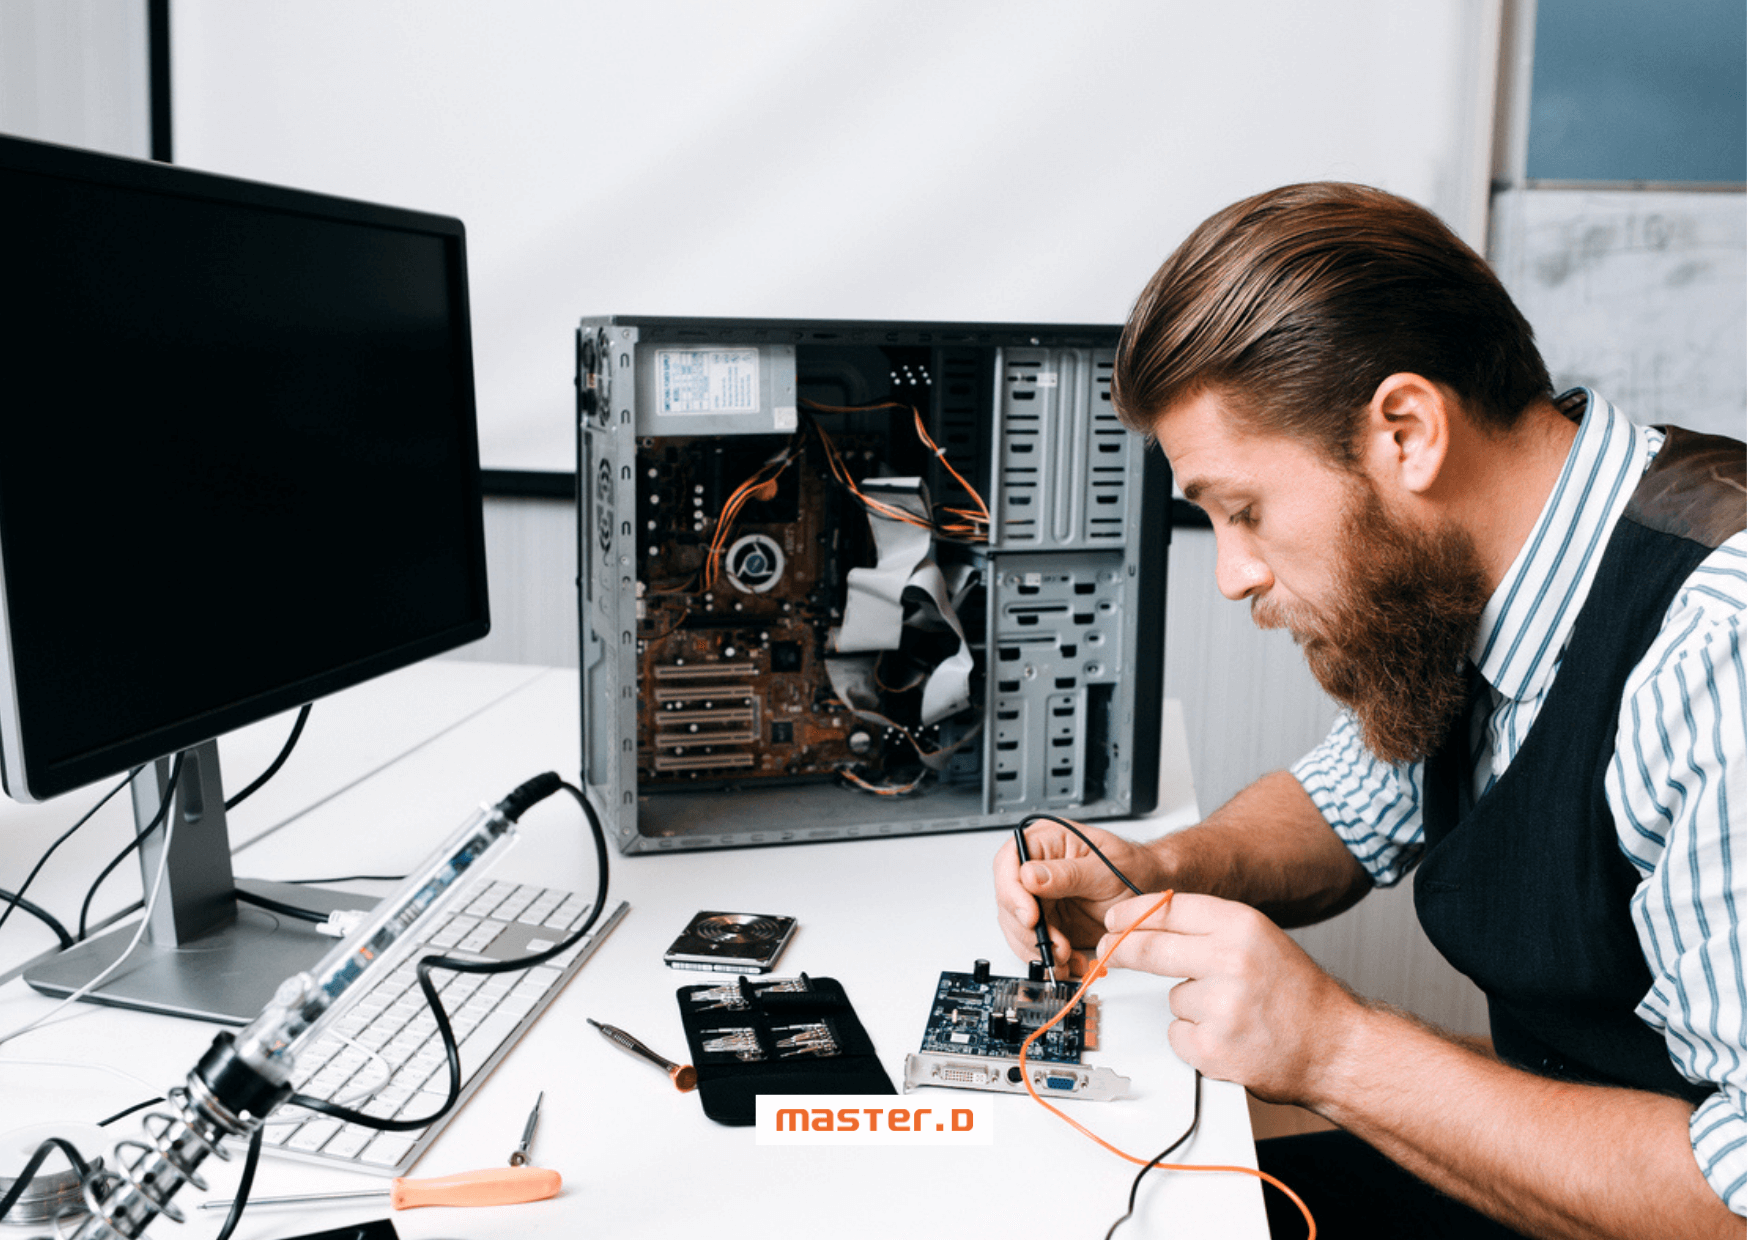 Master D Lisboa - André Silva termina o estágio na área da informática